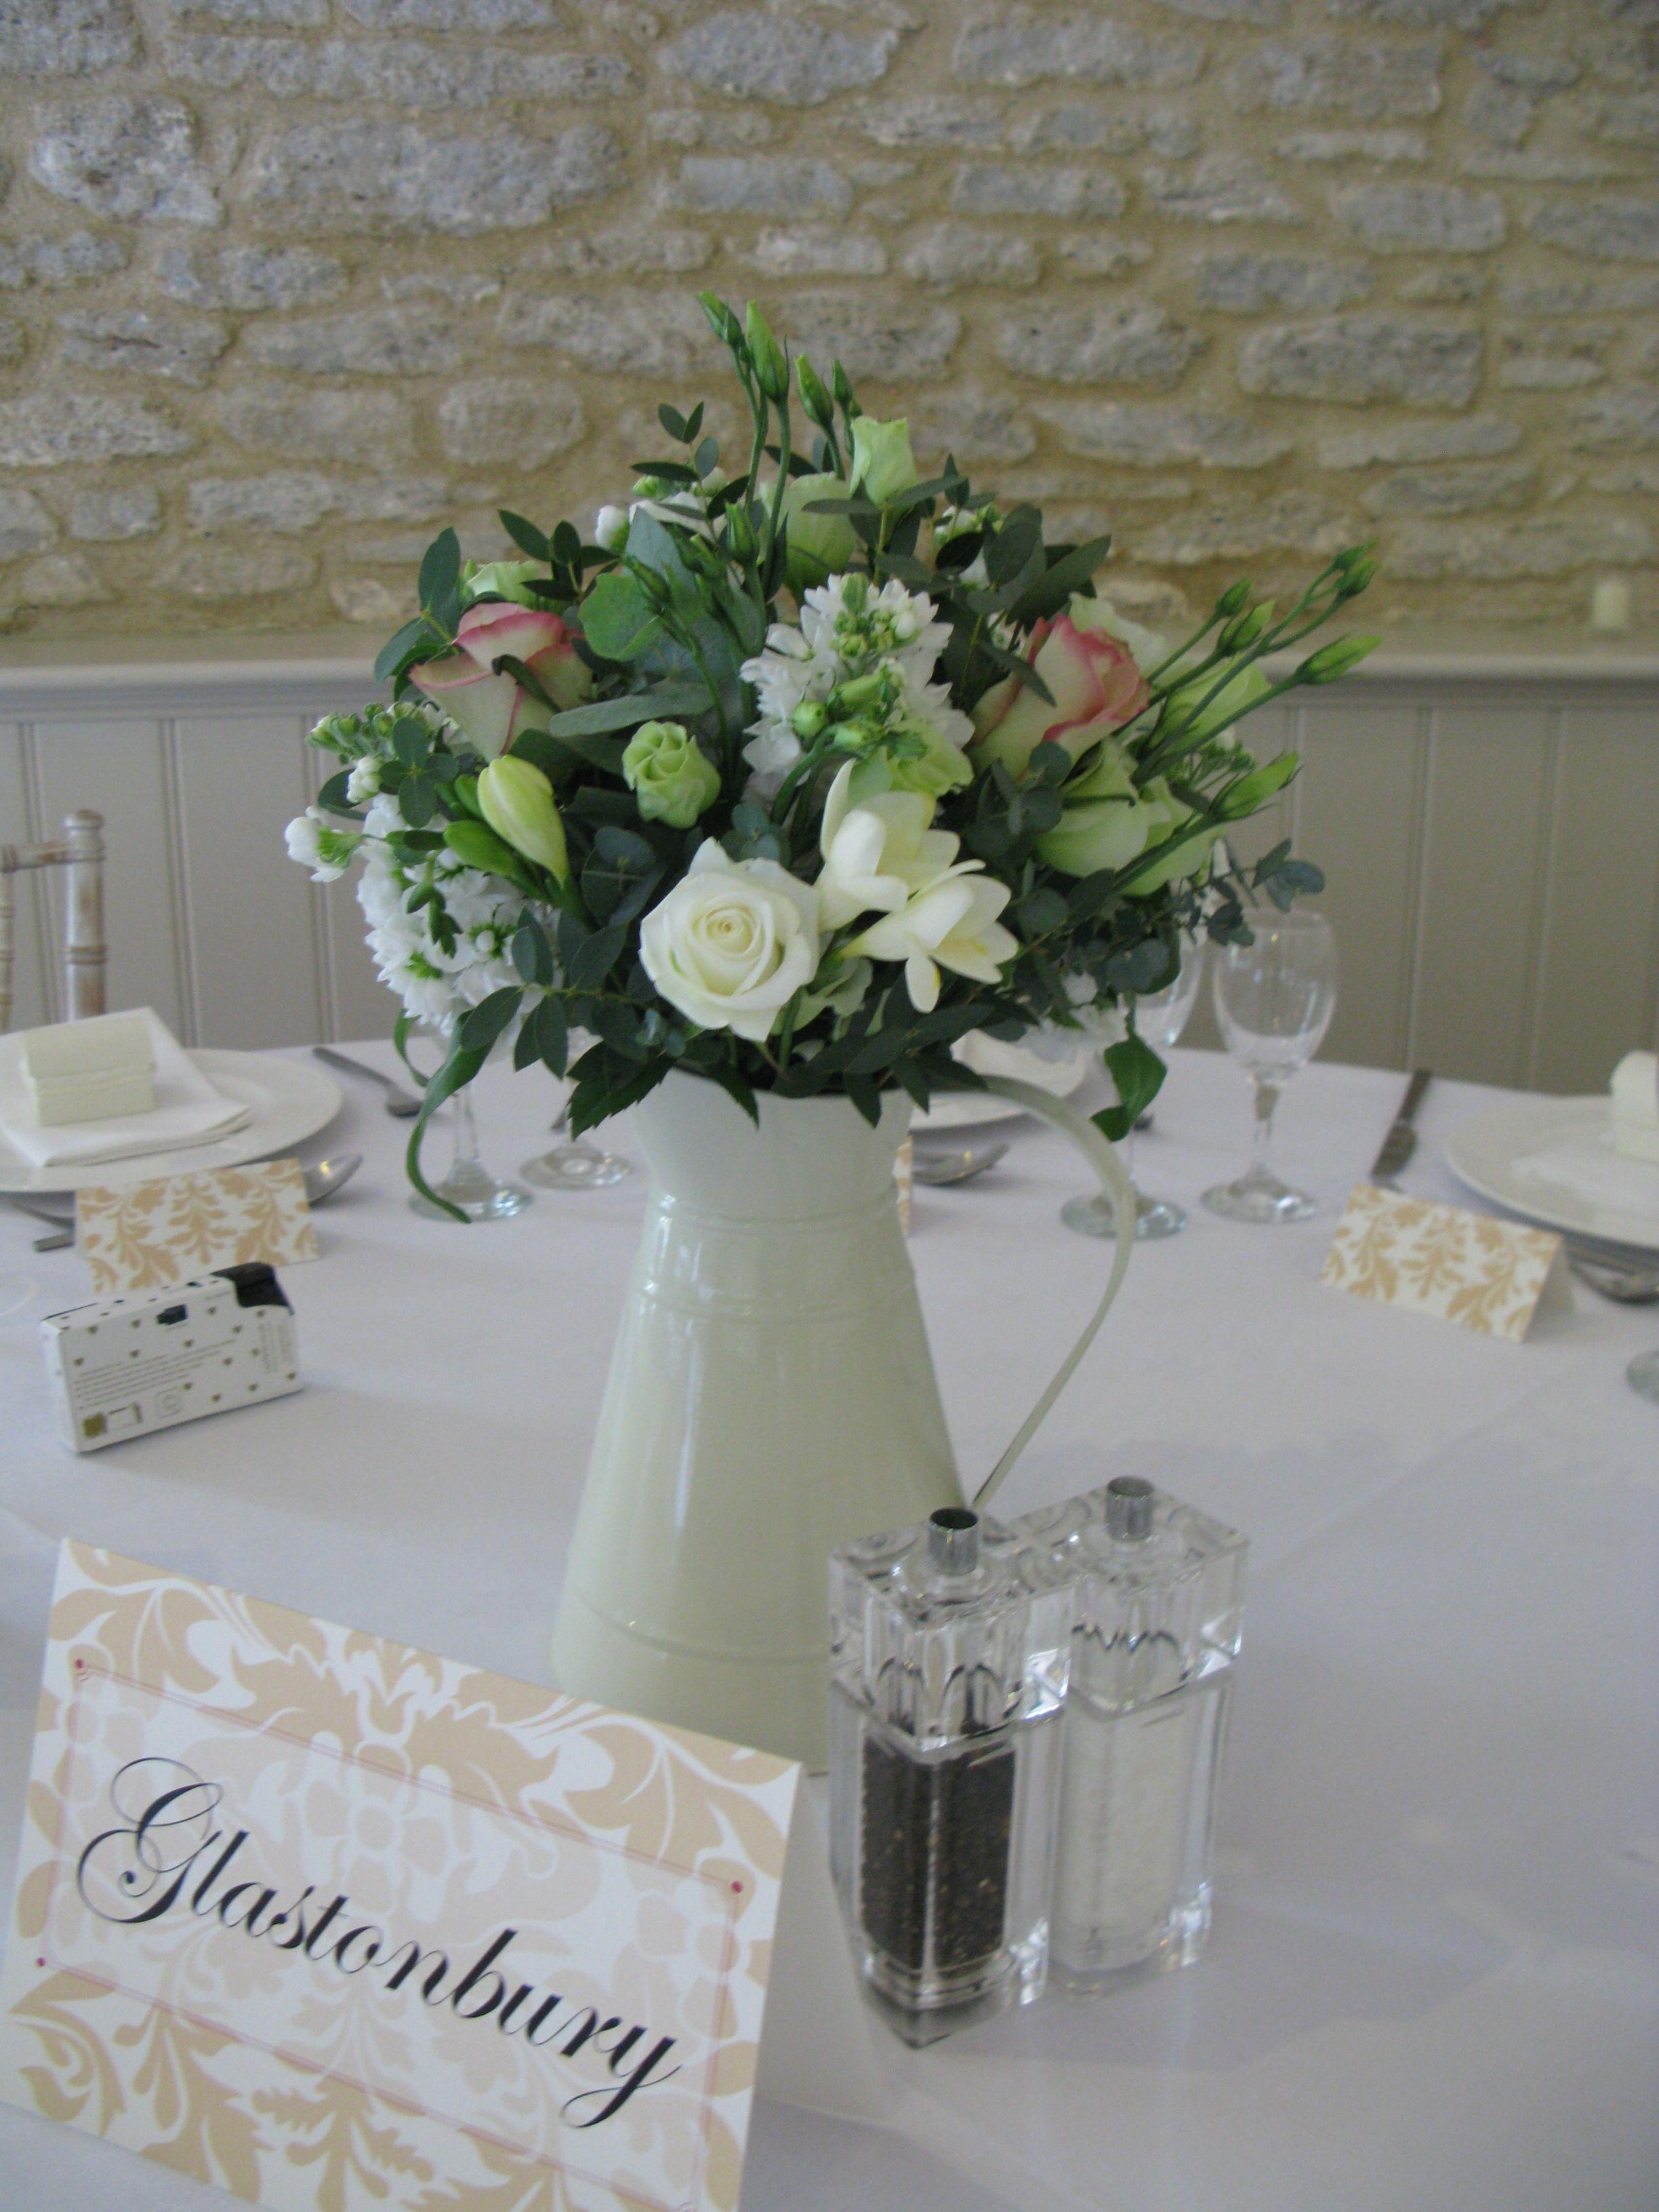 Shabby Chic Cream Metal Jug Wedding Tables Table Decorations